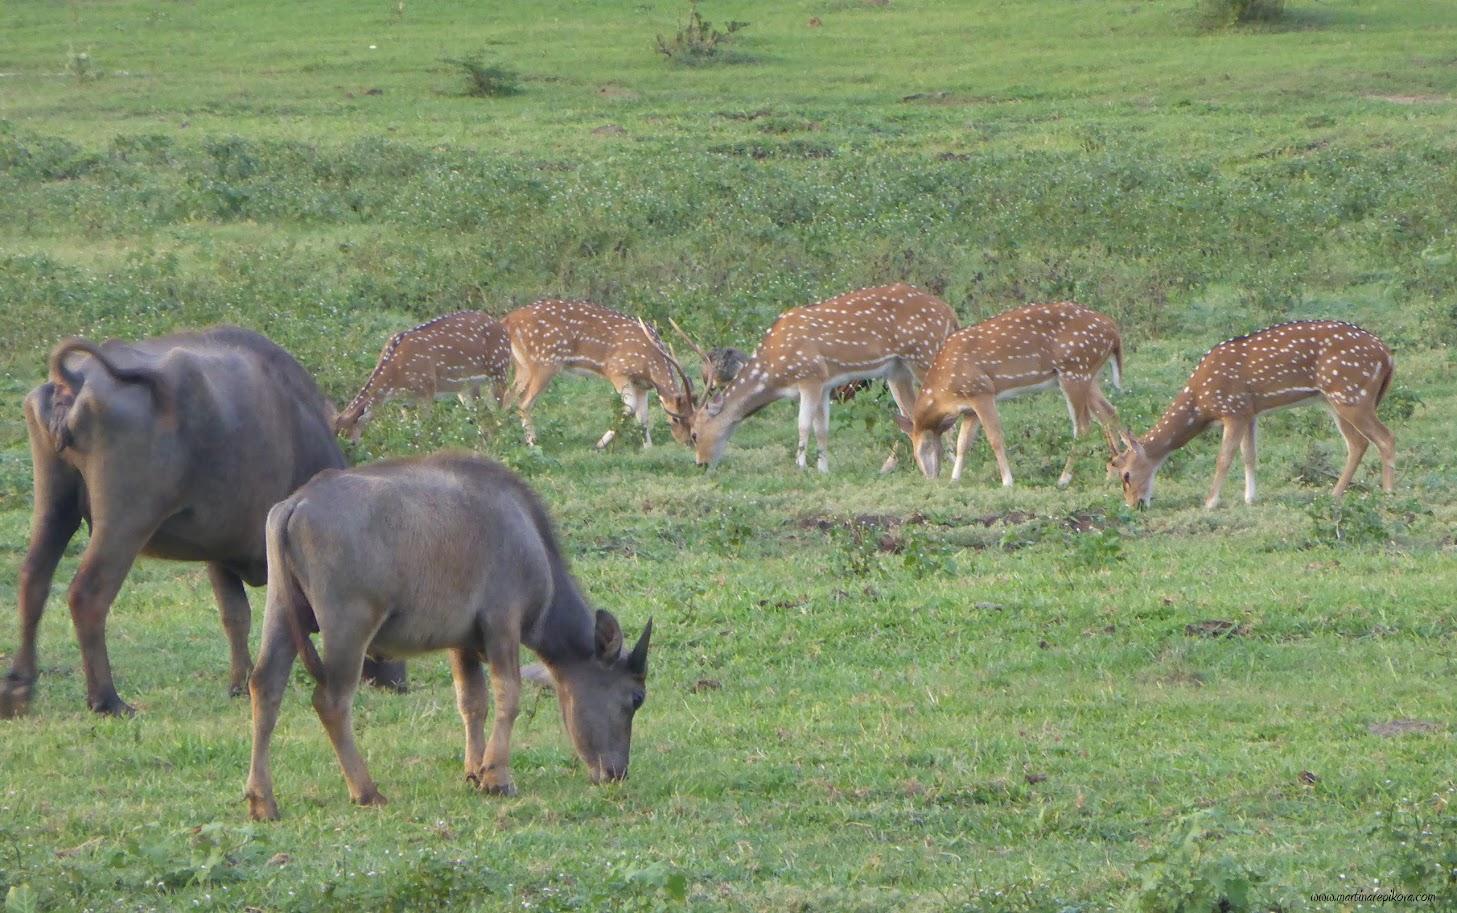 A herd of deers and buffaloes, Uda Walawe, Sri Lanka